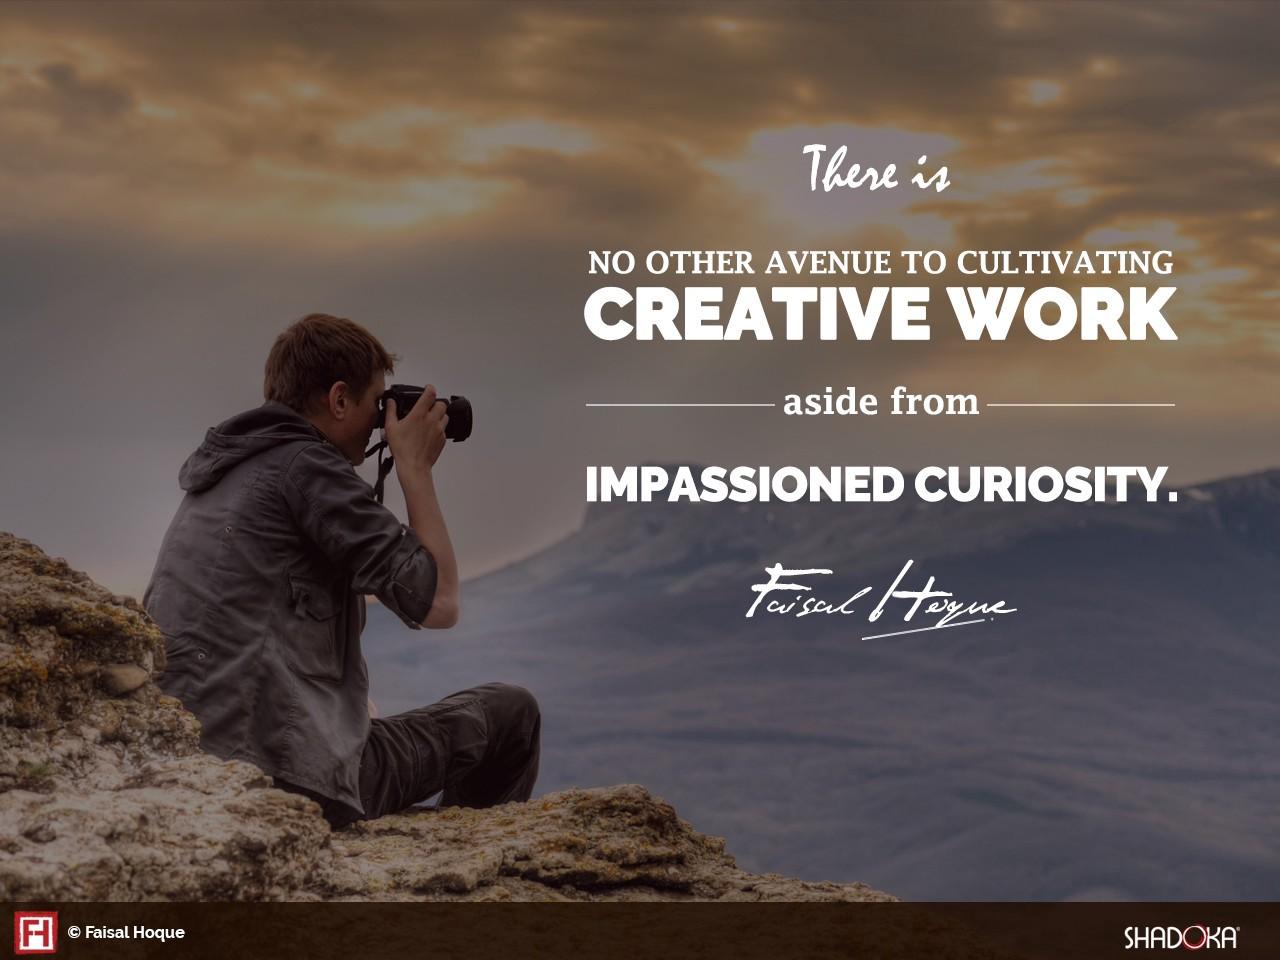 /how-curiosity-cultivates-creativity-65b71c1c2b4d feature image